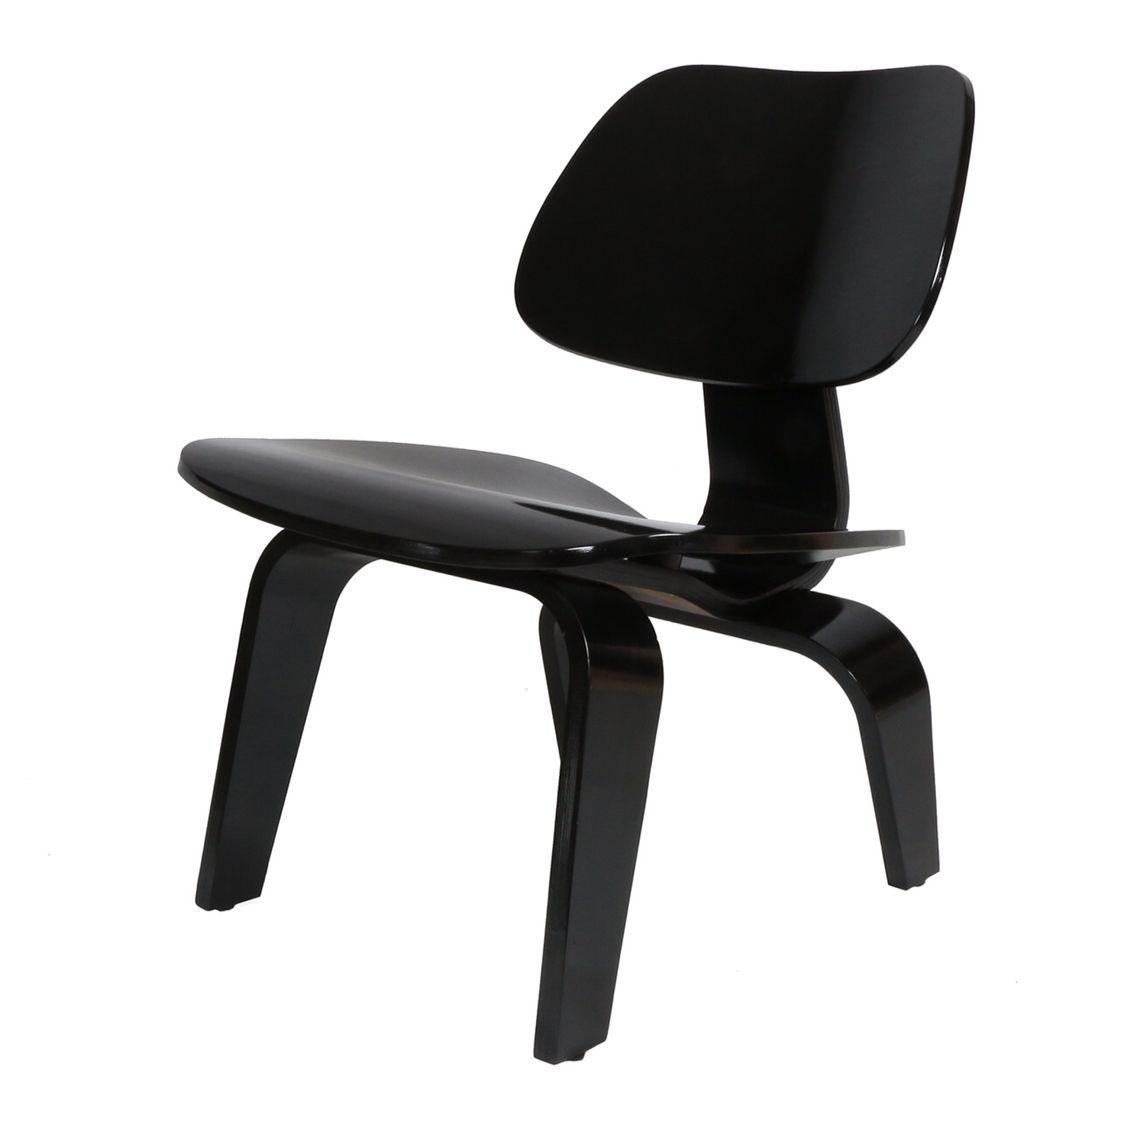 Silla Wood Low Black replica de la silla LCW en www.lasddi.com ...